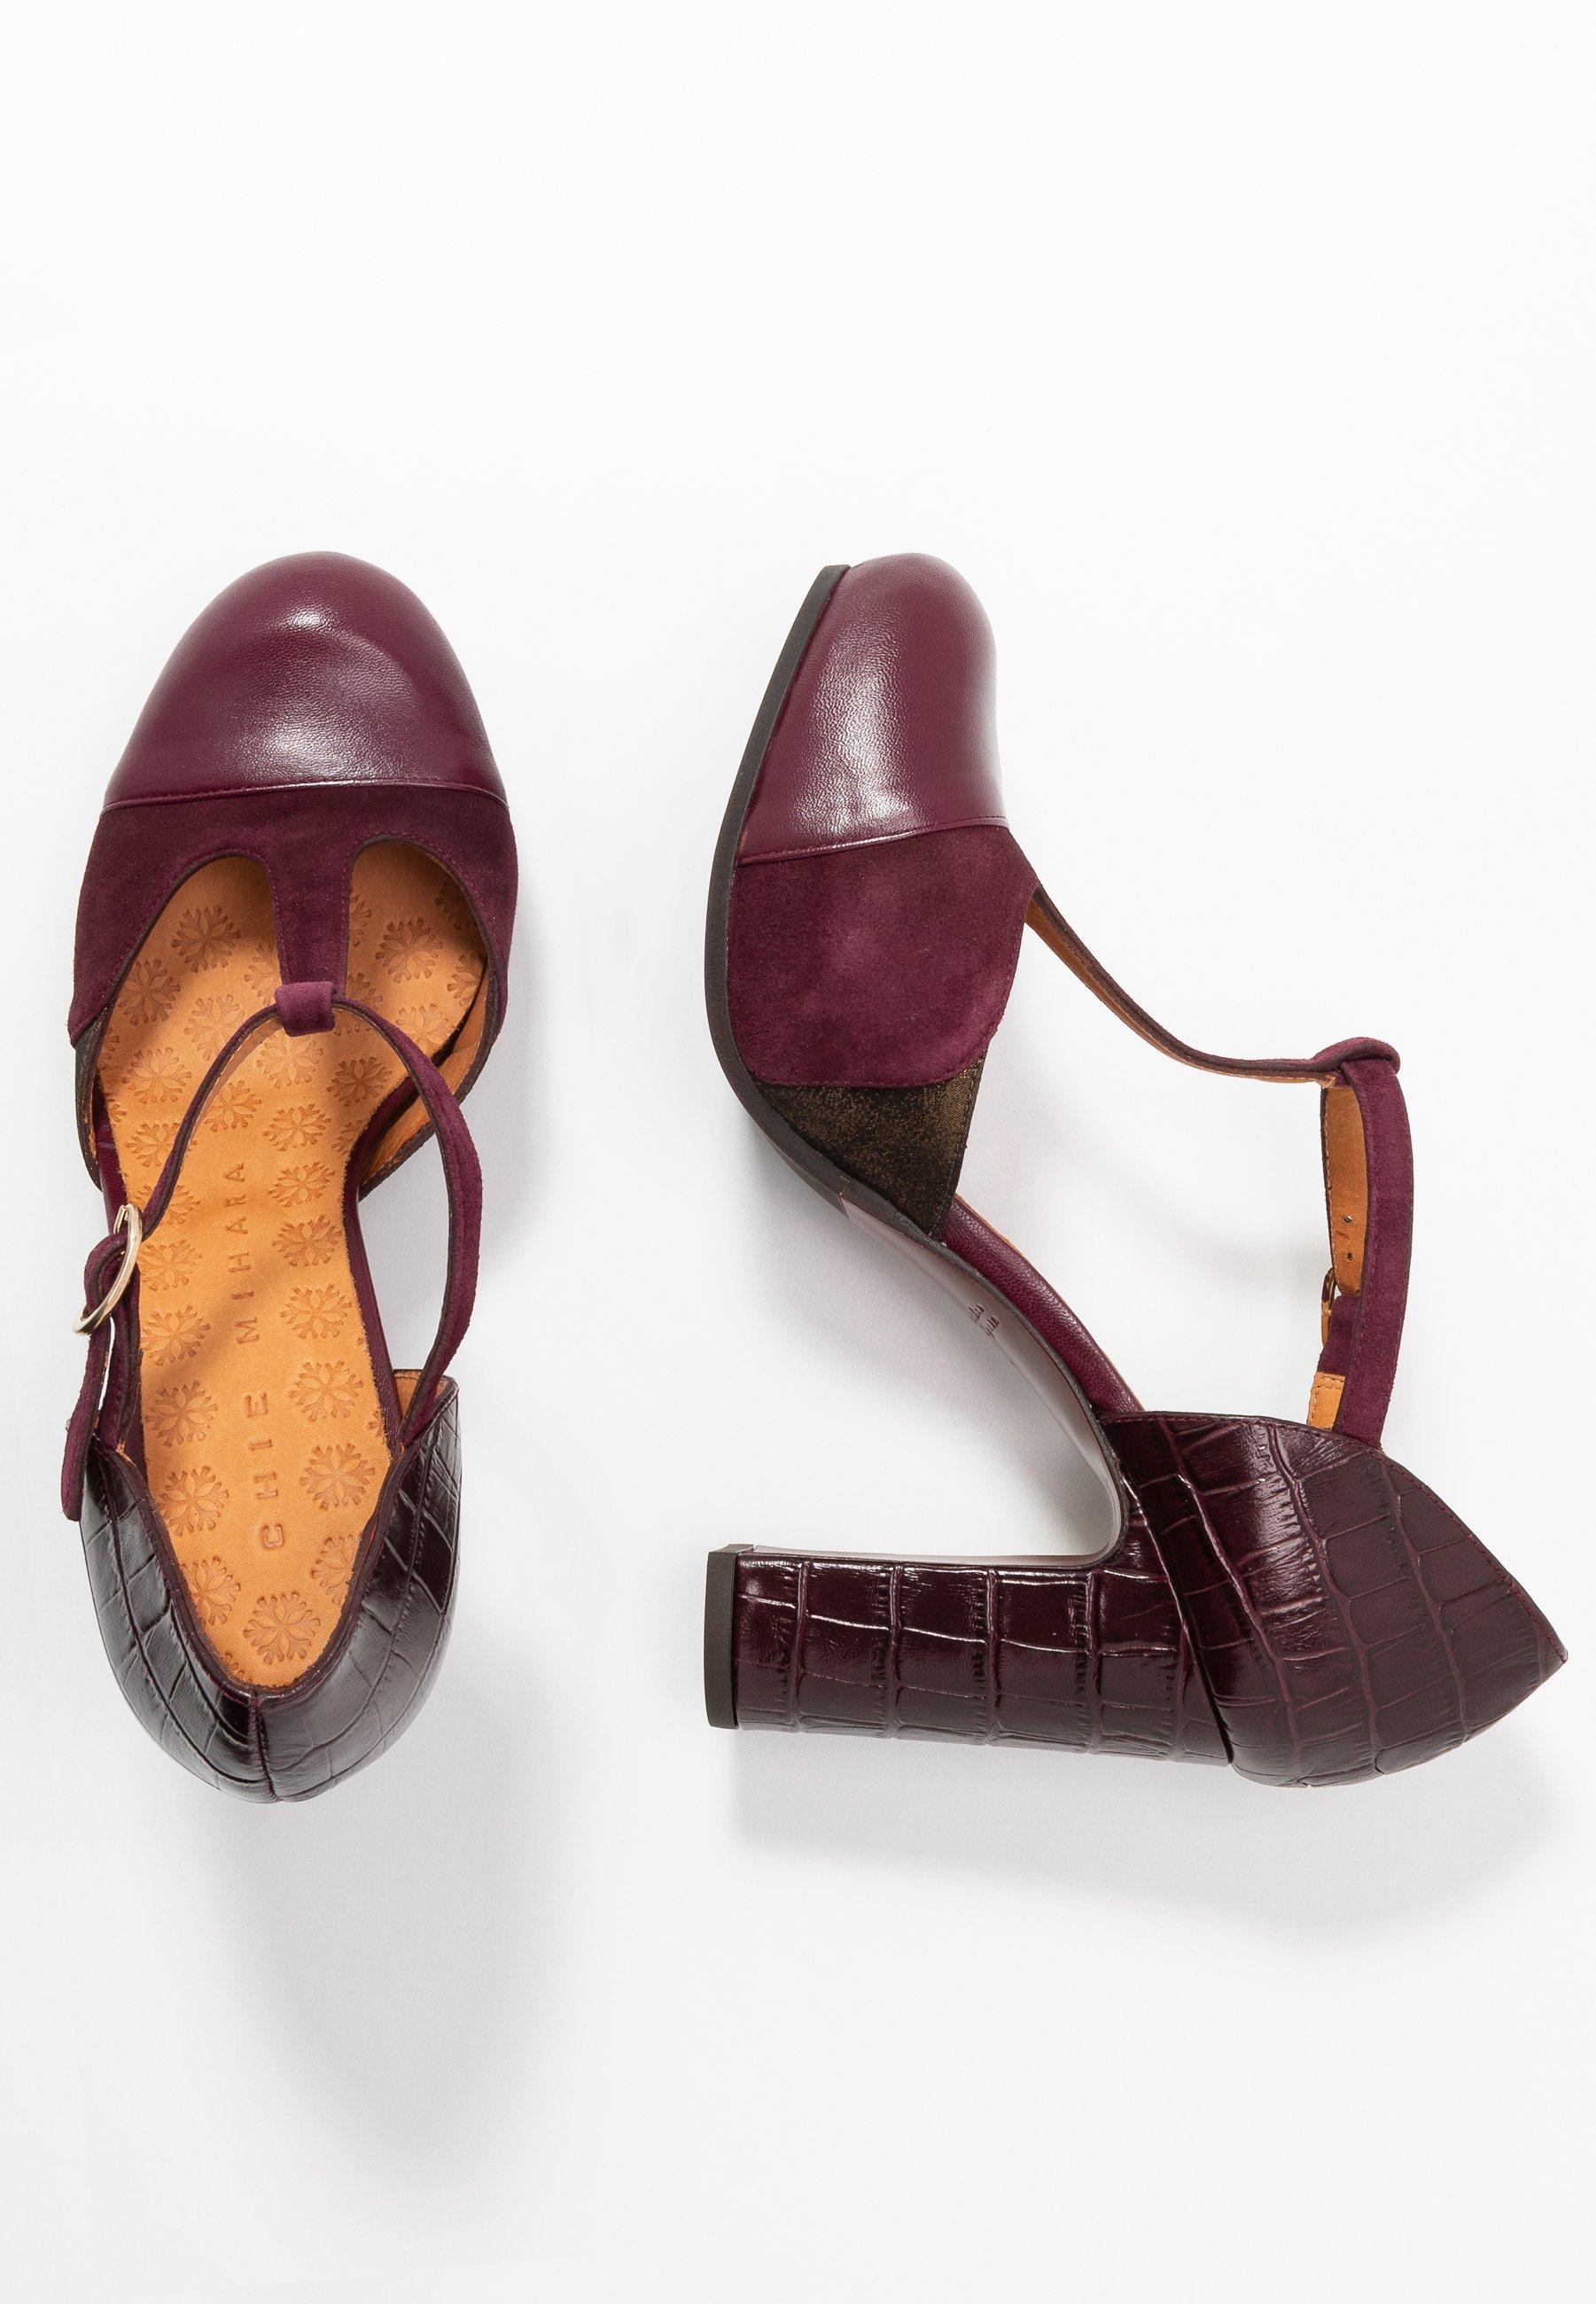 Chie Mihara DARCO - High heels - freya grape/lame bronce/kenya